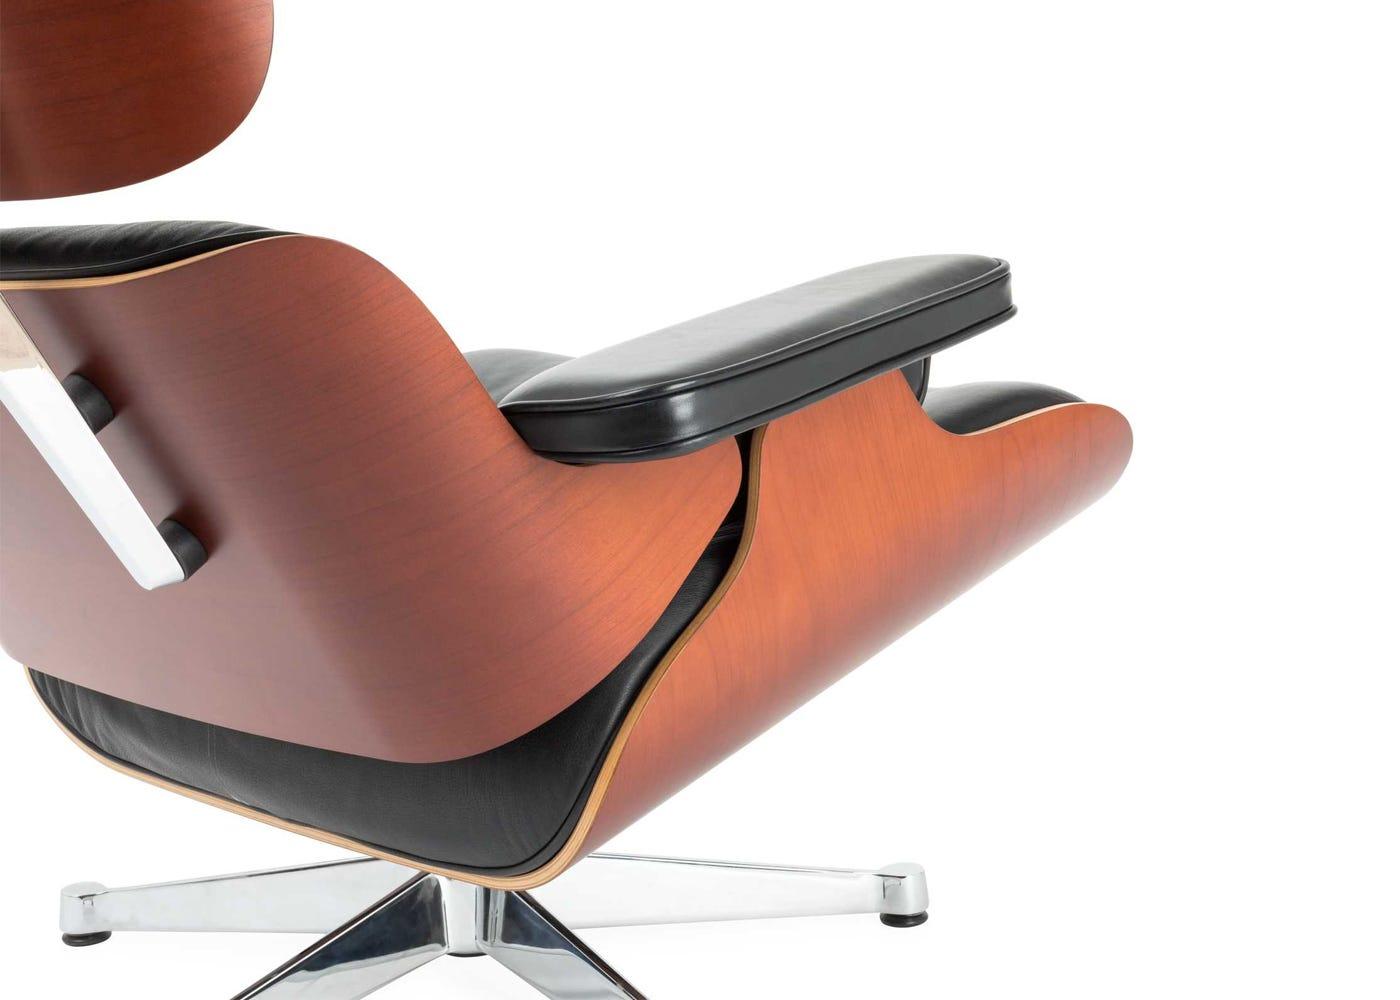 vitra eames lounge chair ottoman classic black. Black Bedroom Furniture Sets. Home Design Ideas